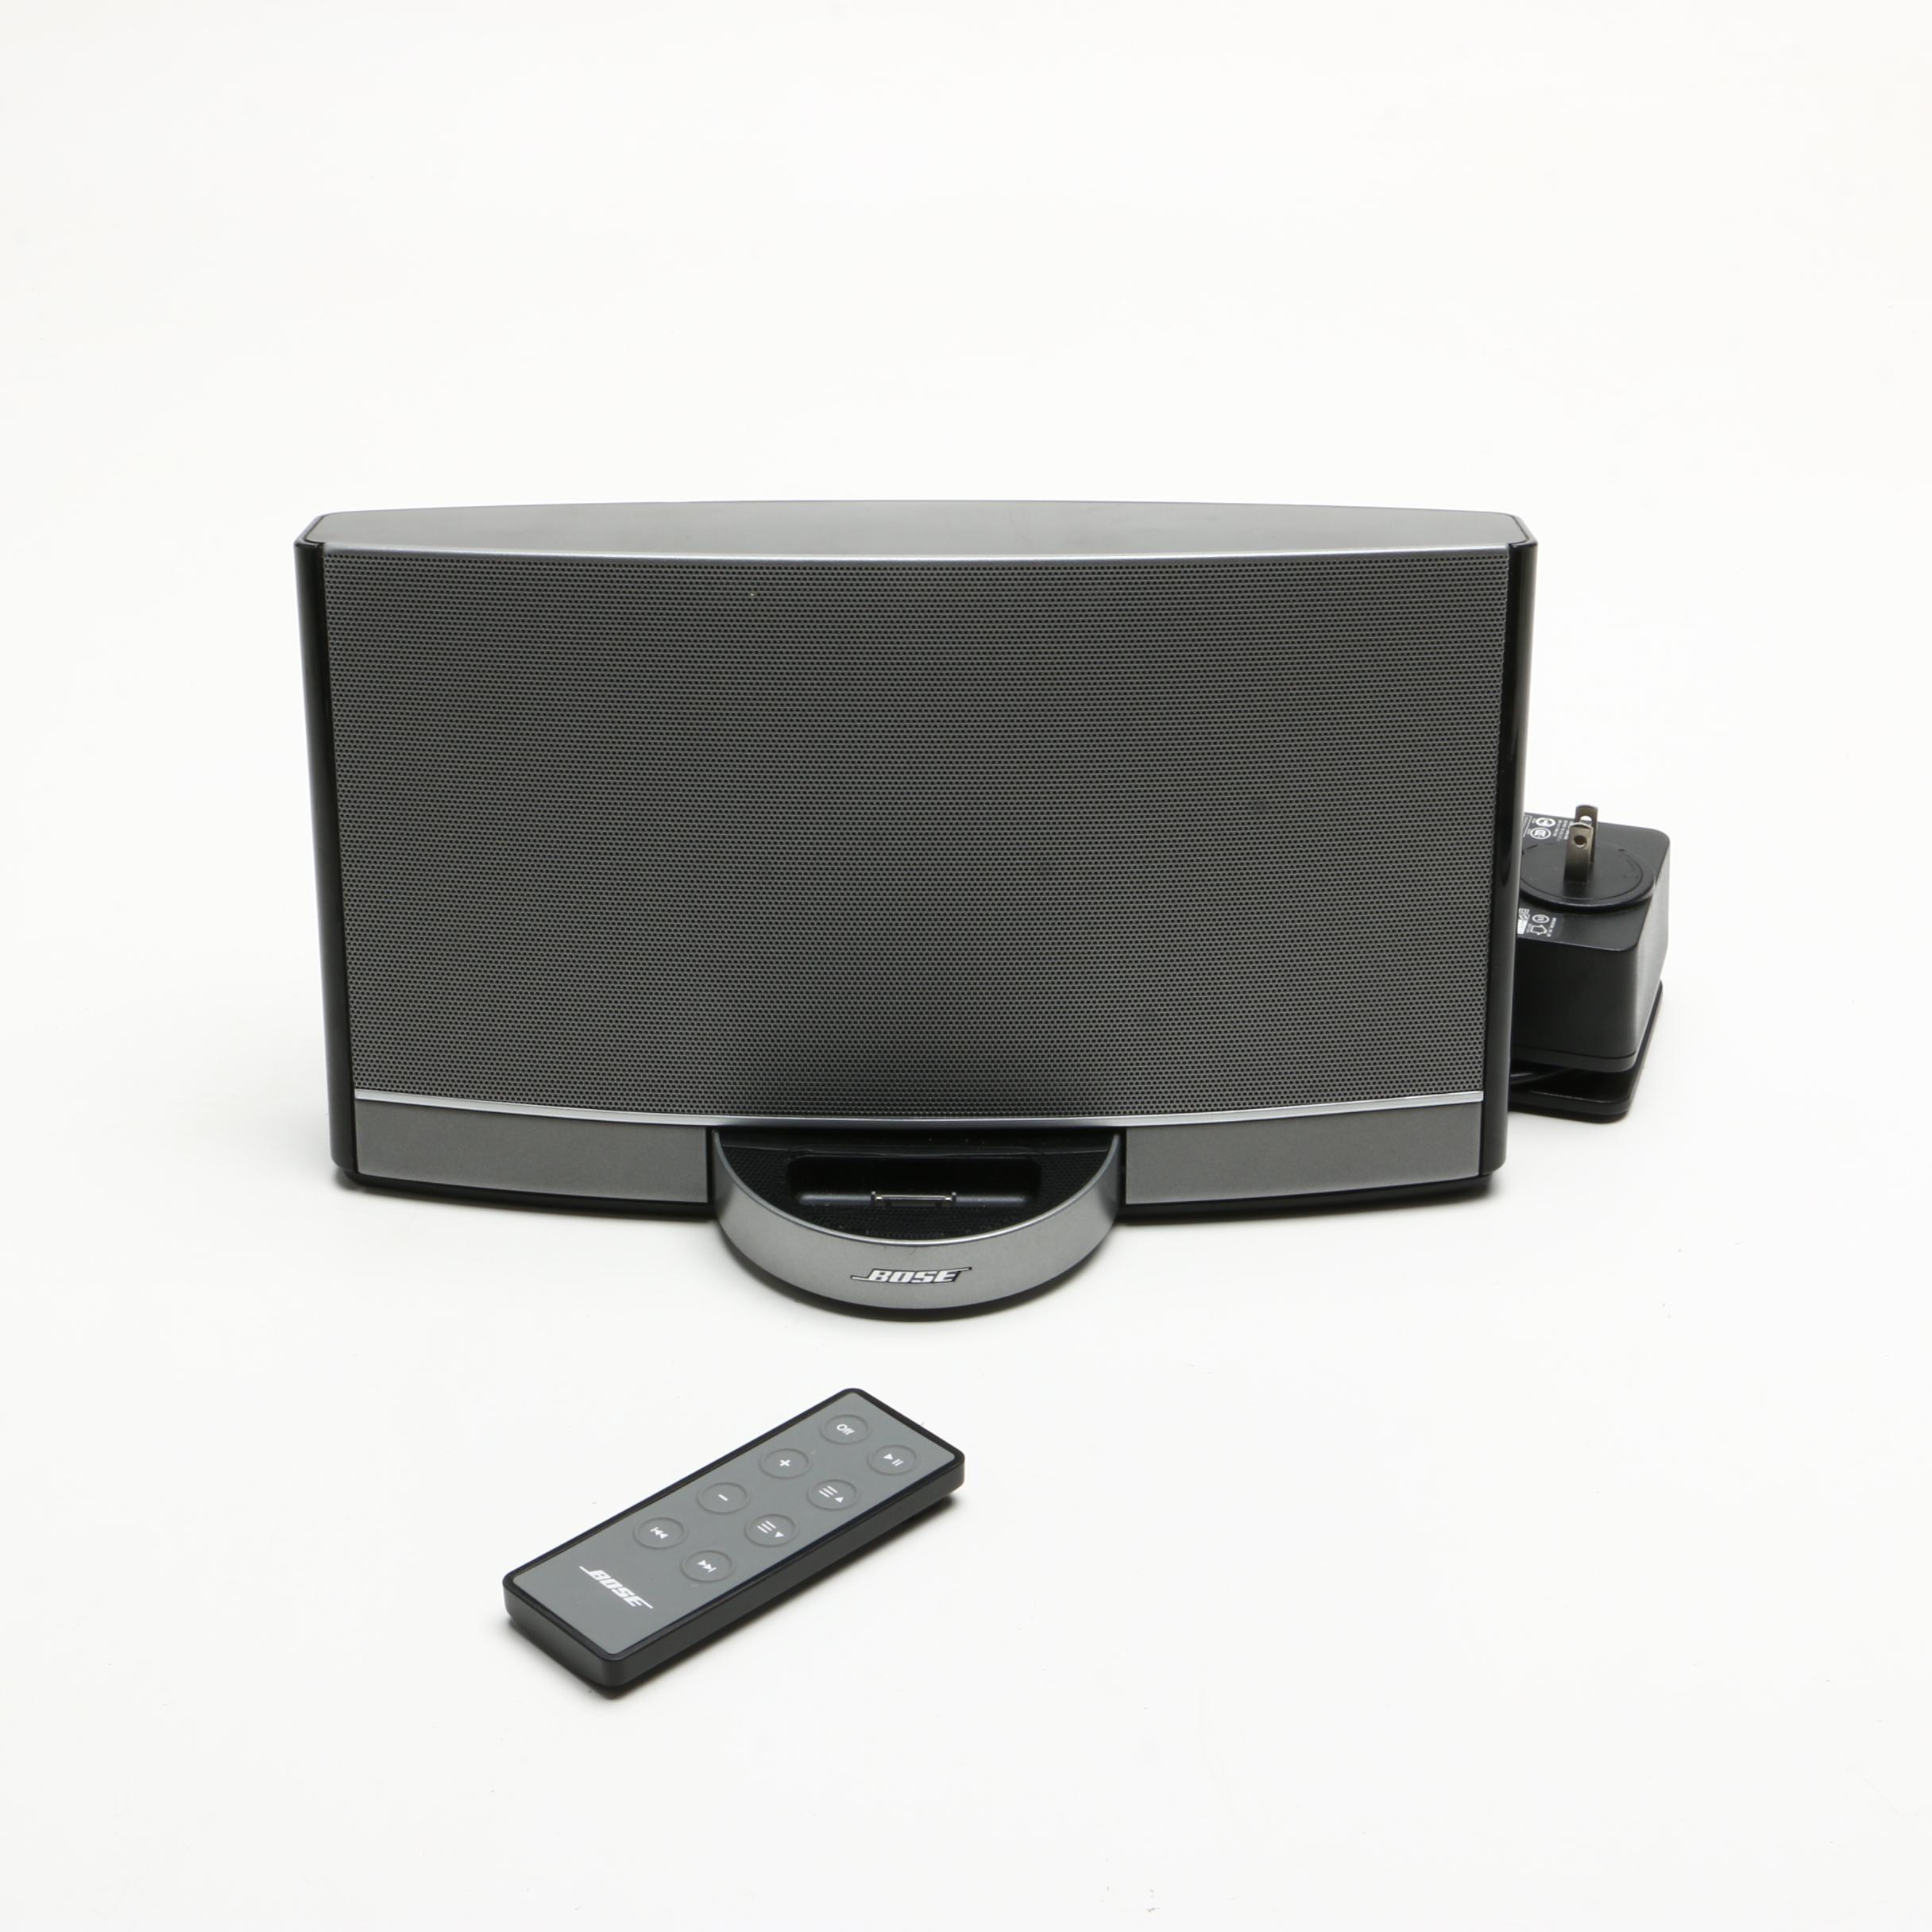 Bose Dock Speaker